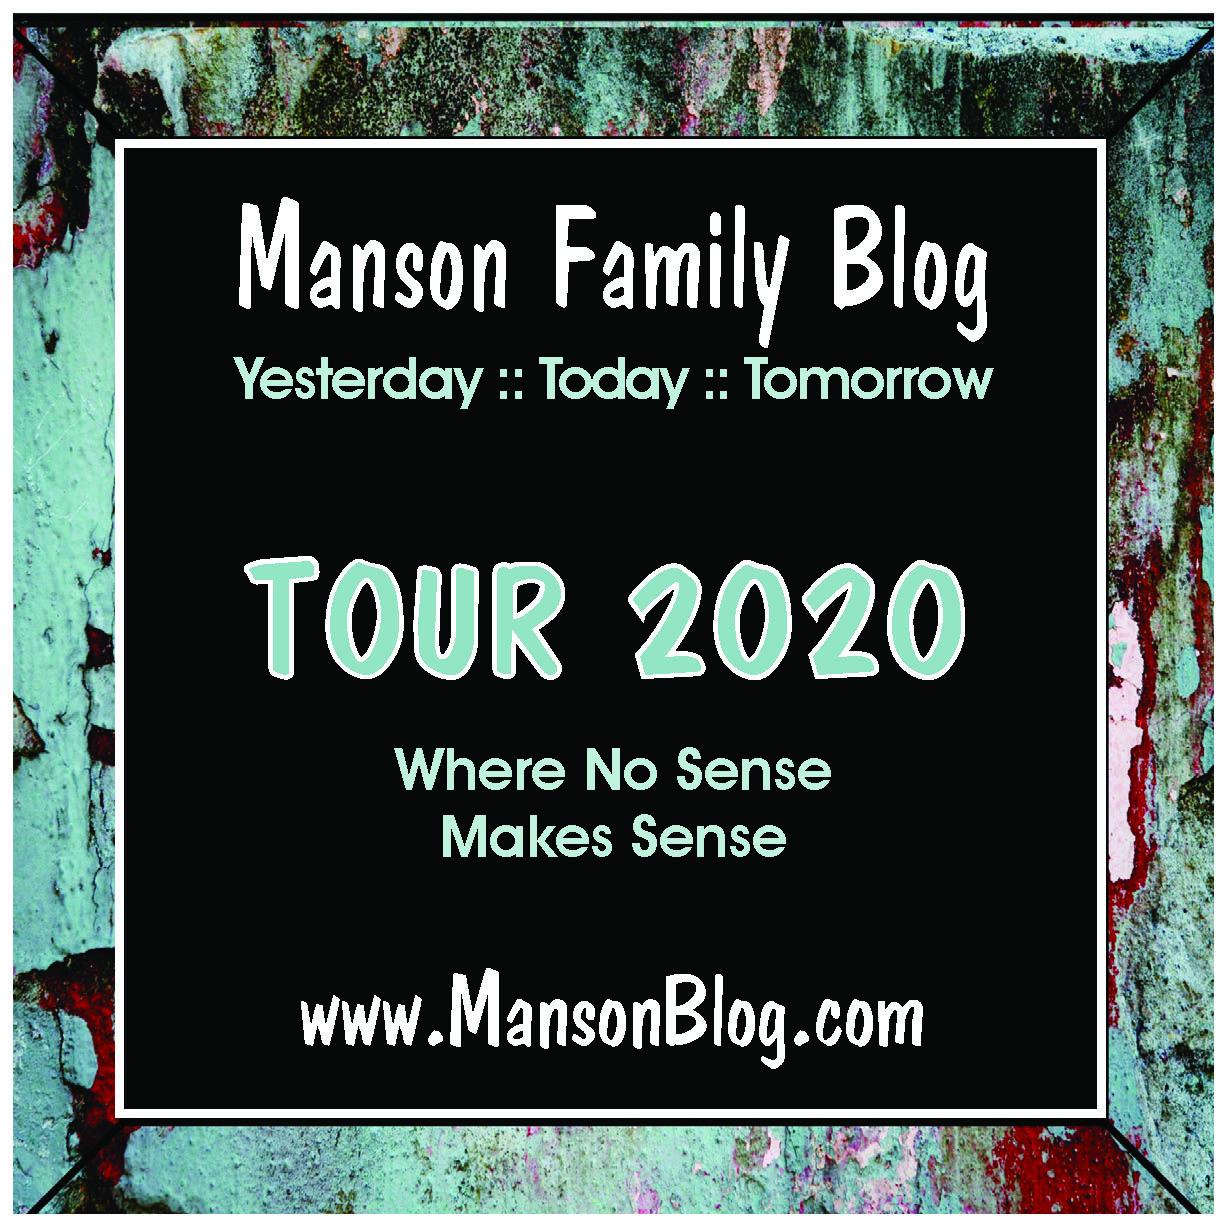 Manson Tour 2020 The Manson Family Blog   Tate LaBianca Murders   TLB   True Crime